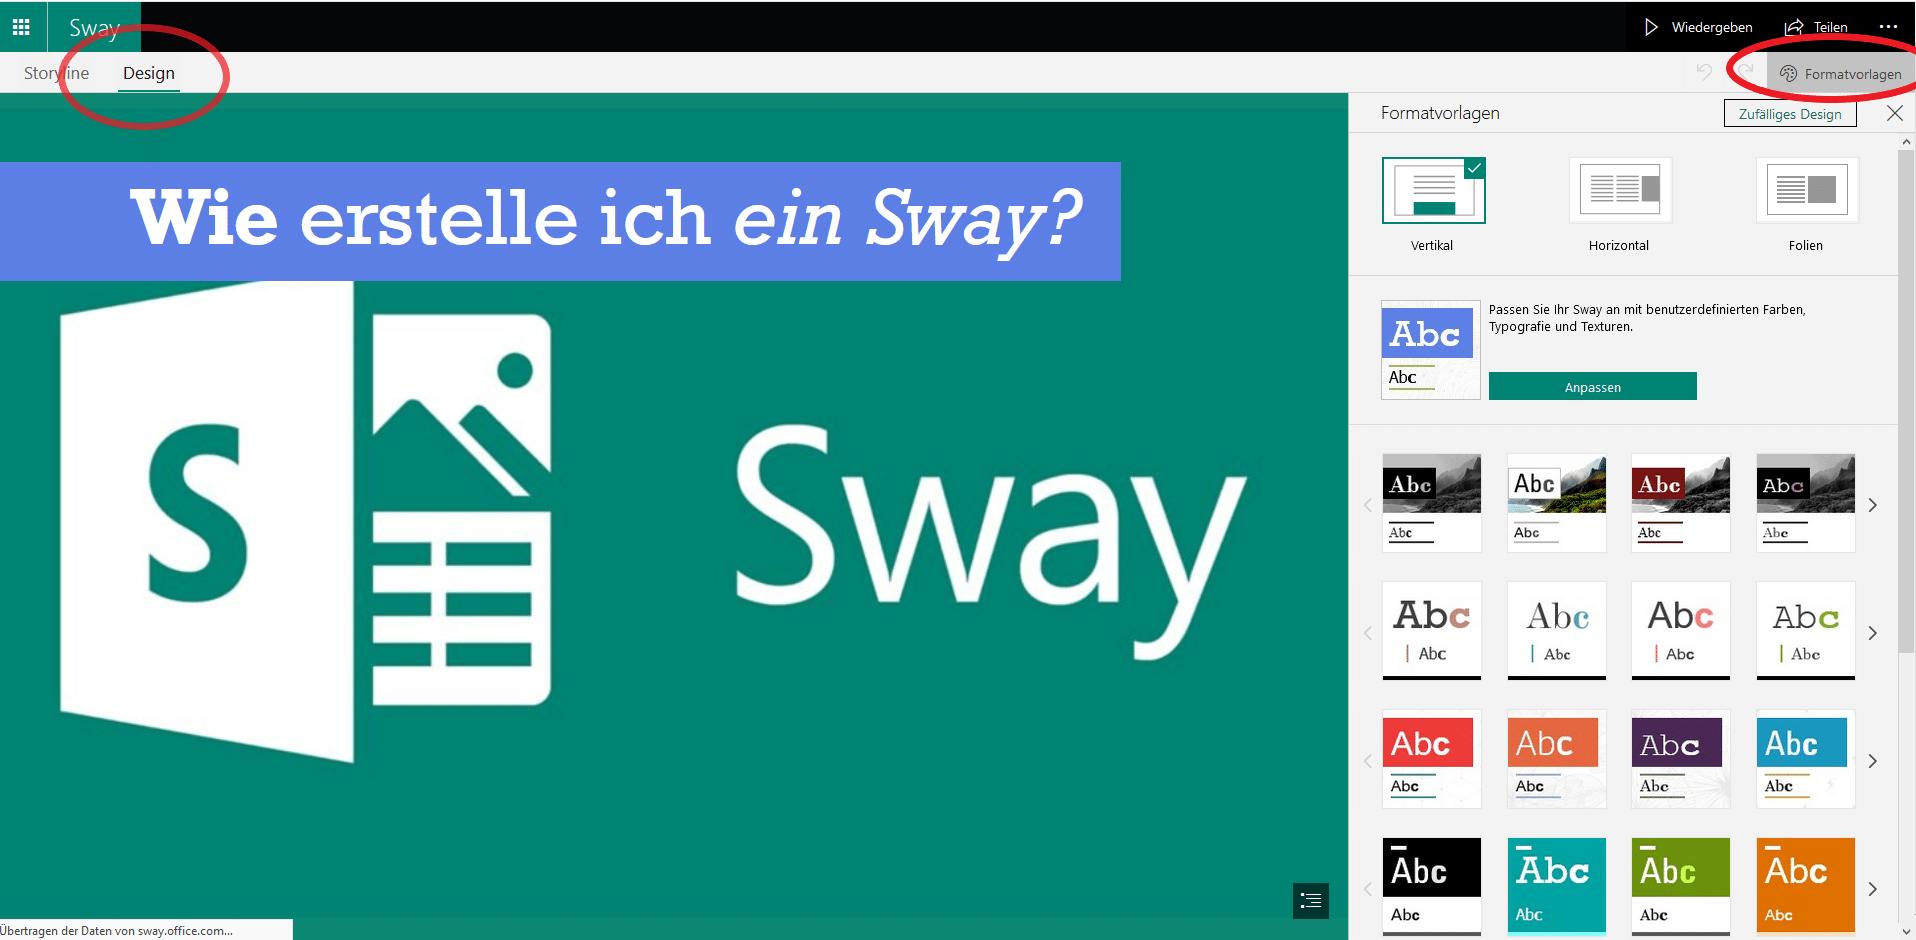 Design Menüpunkt in Microsoft Sway